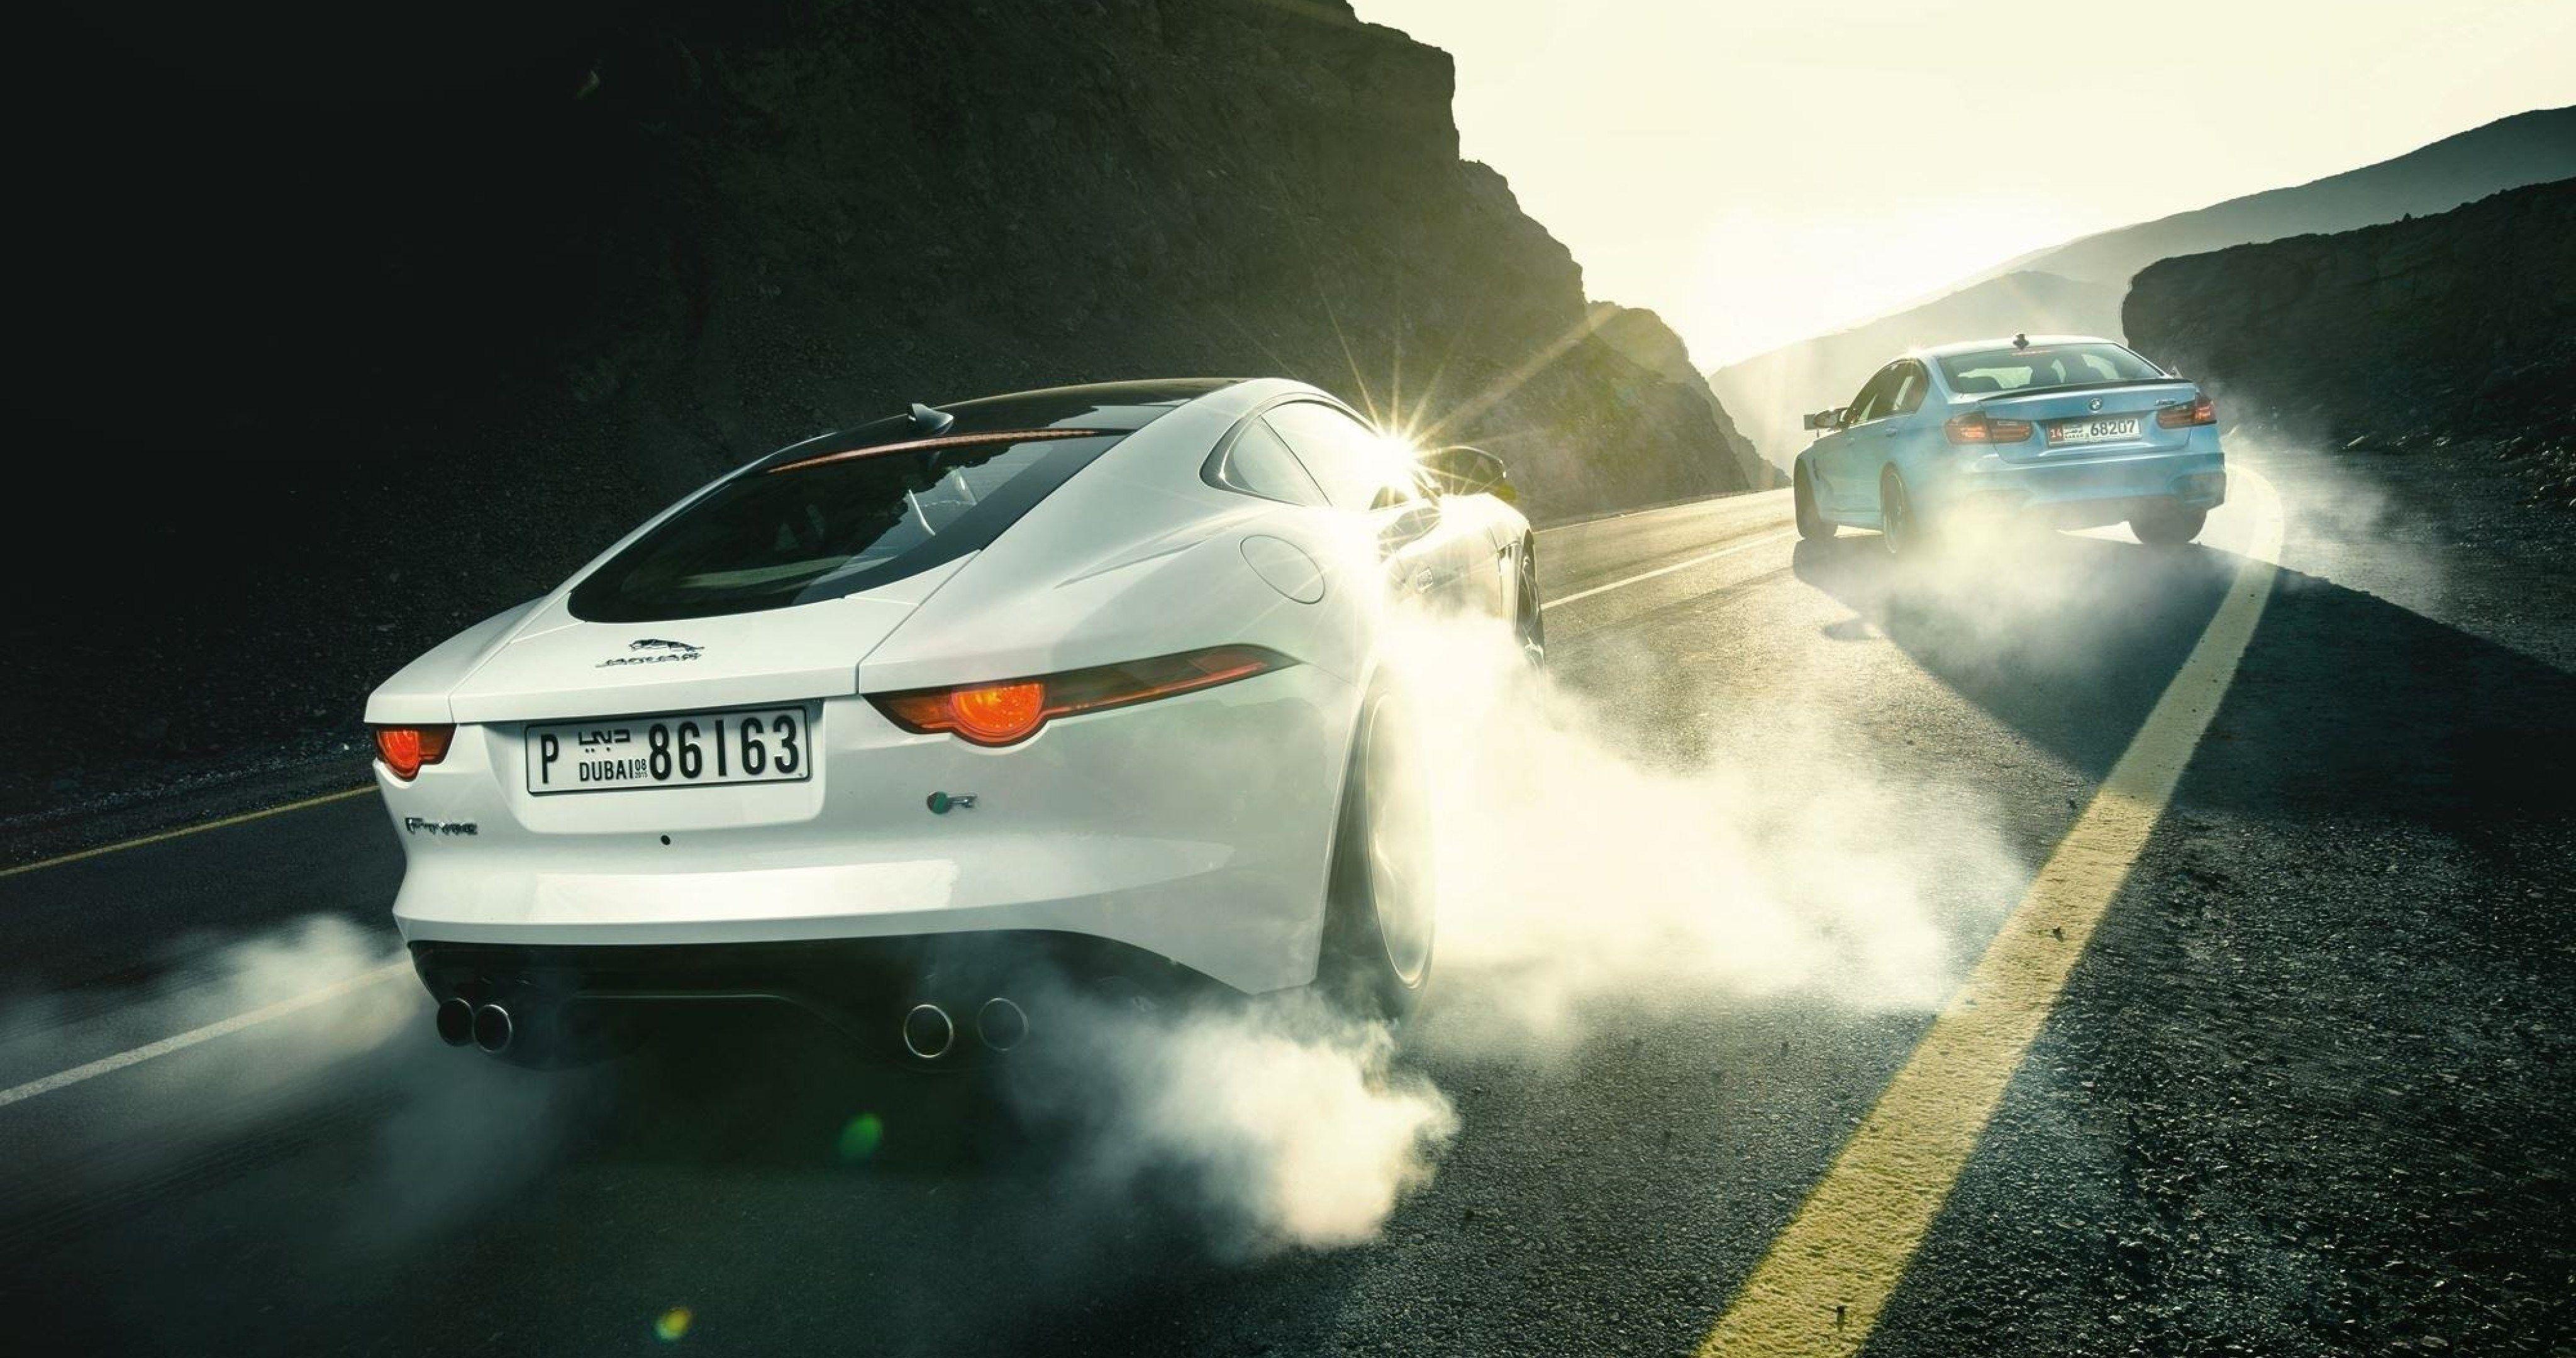 Jaguar F Type R And Bmw M3 Drifting 4k Ultra Hd Wallpaper